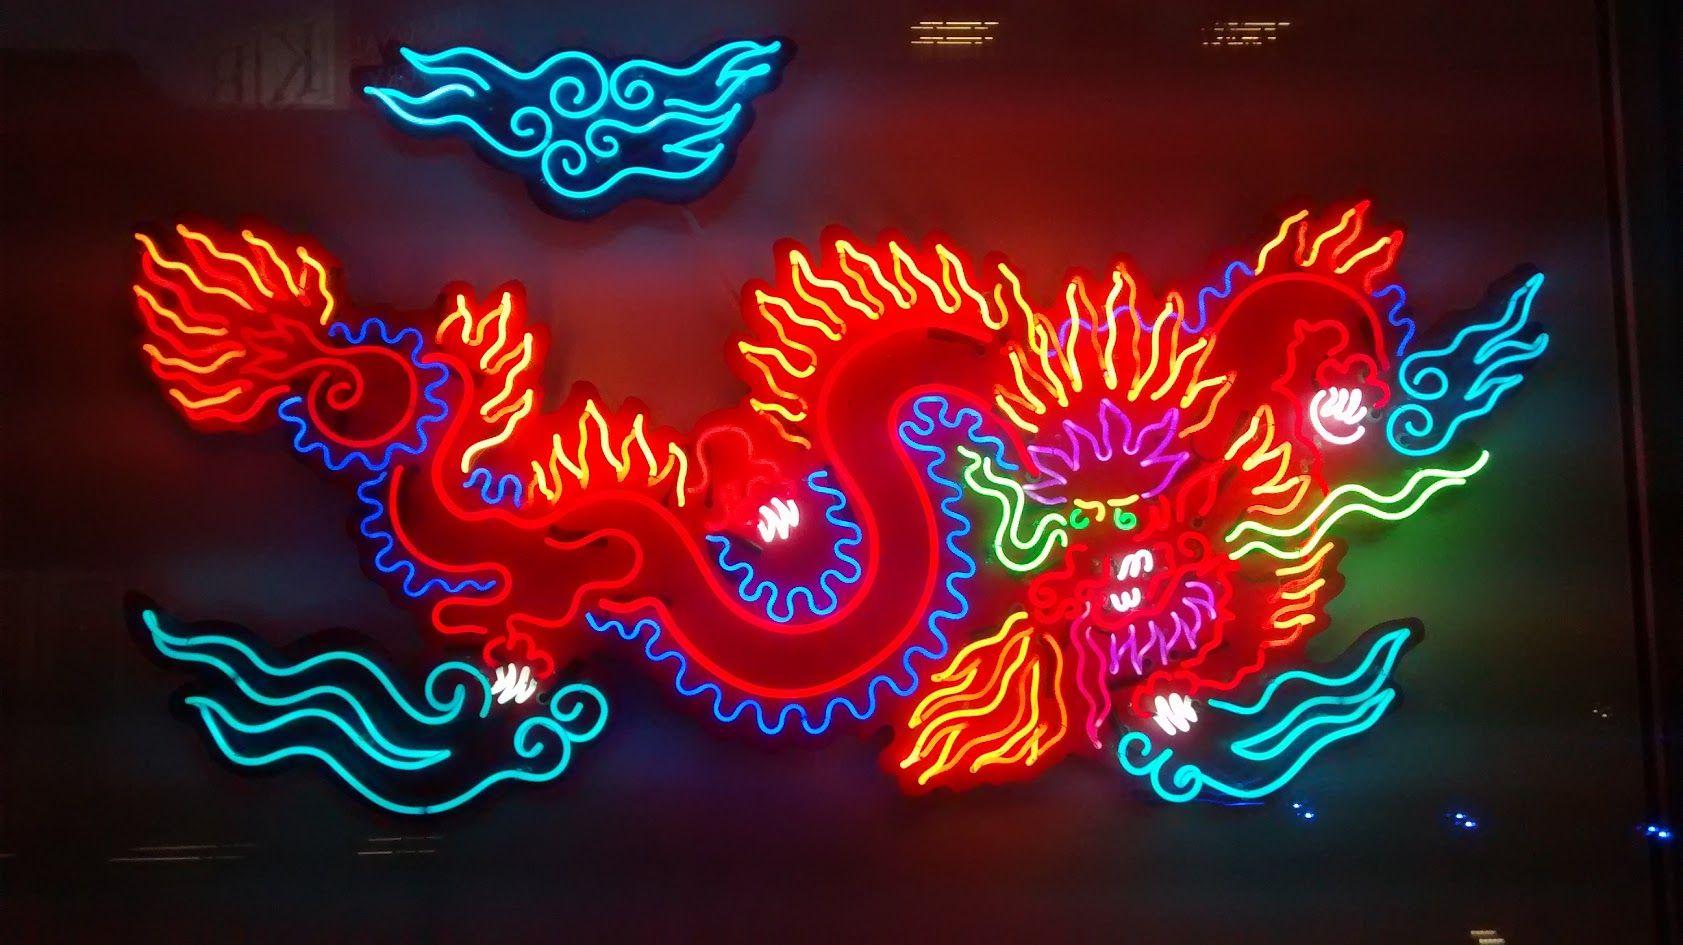 Museum Of Neon Art - Wikipedia Free Encyclopedia